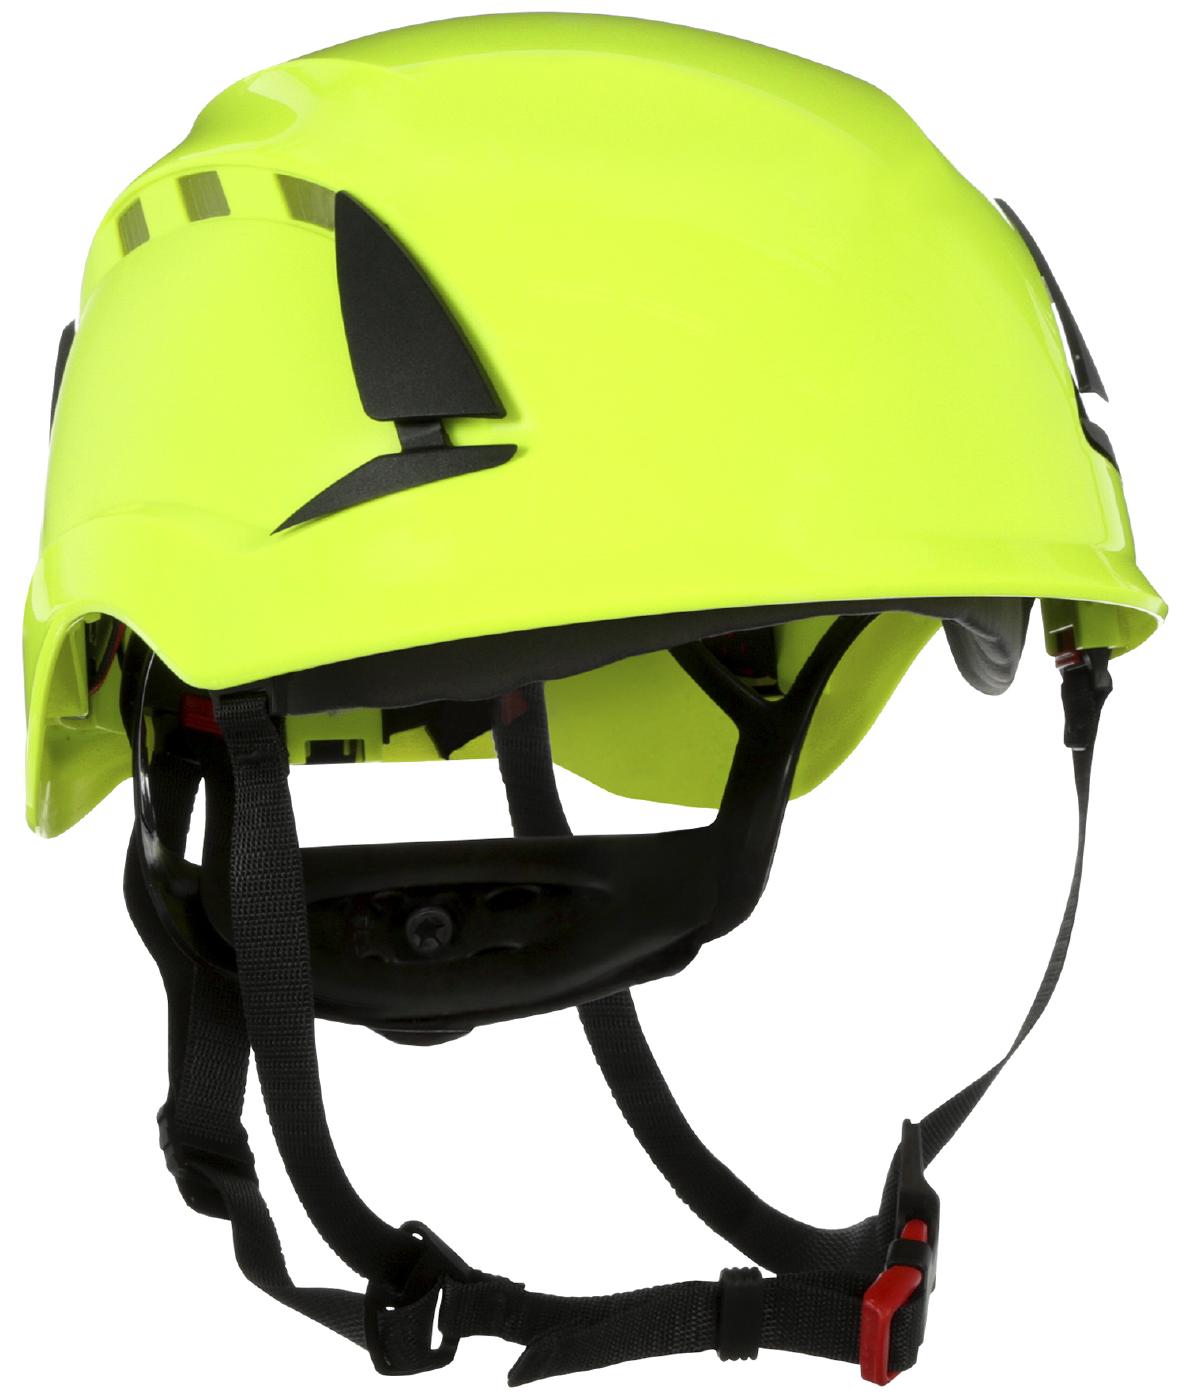 Image of   Skikkerhedshjelm 3M X5000VE-CE Gul